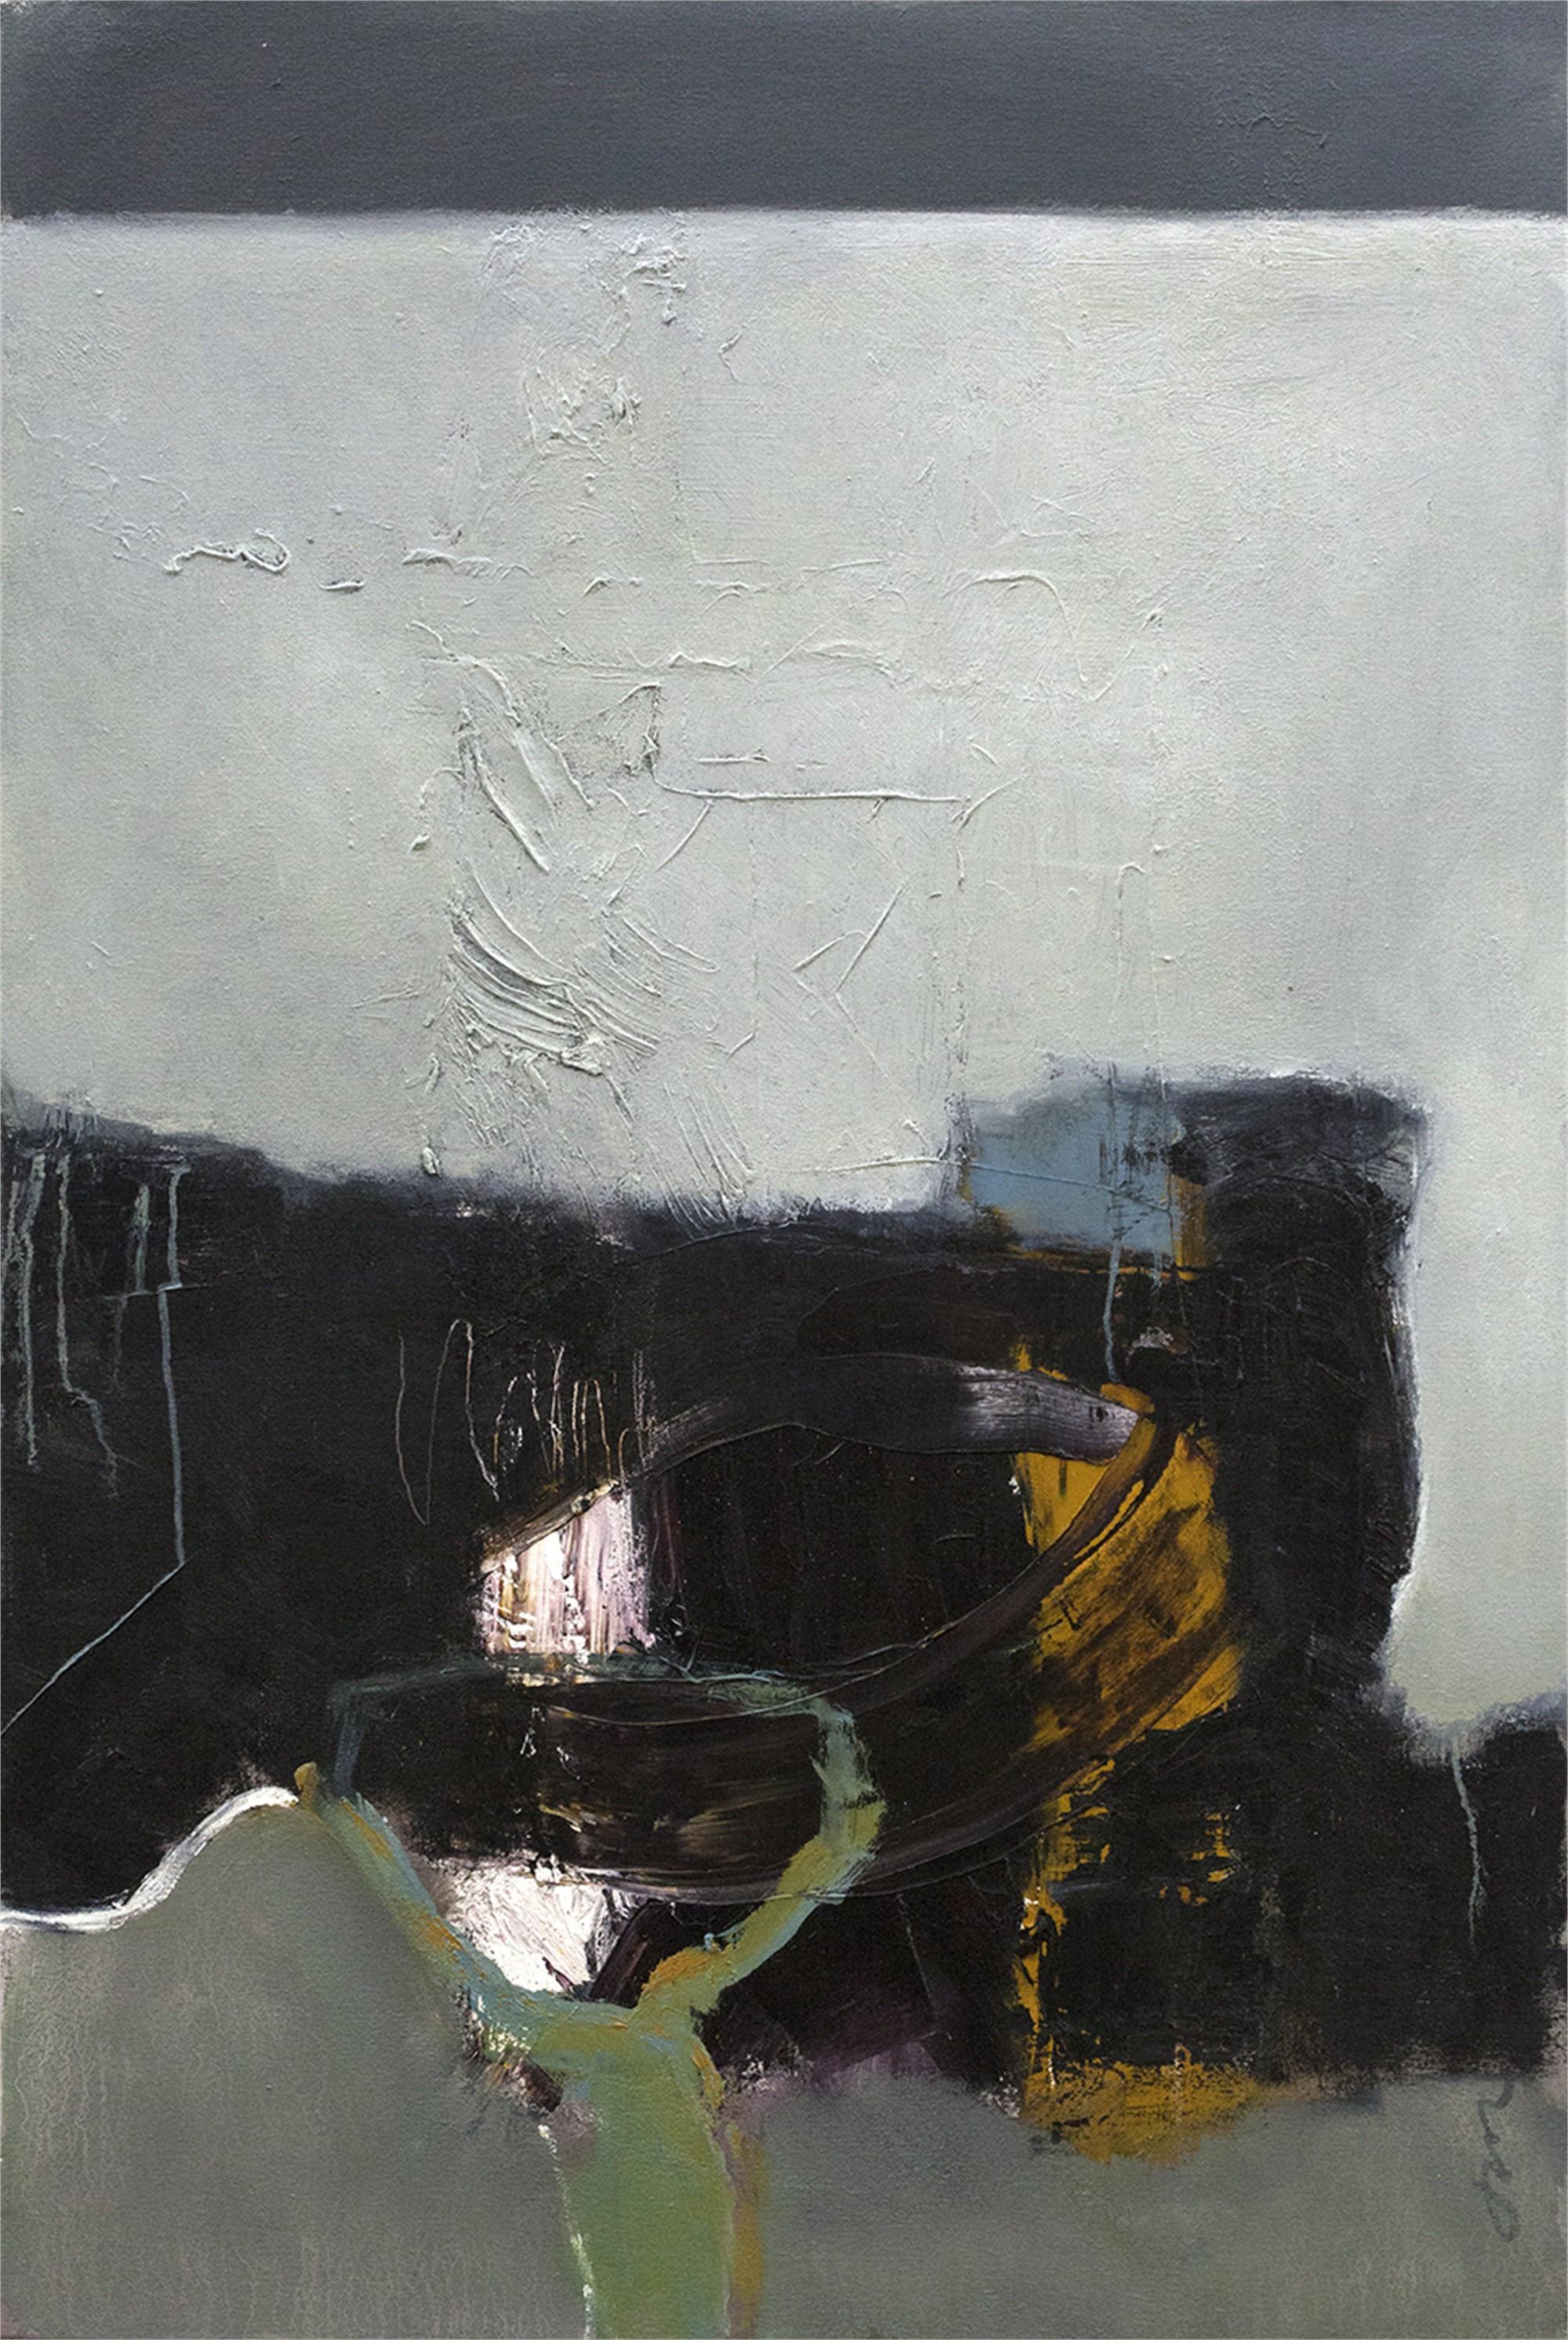 Untitled by John McCaw